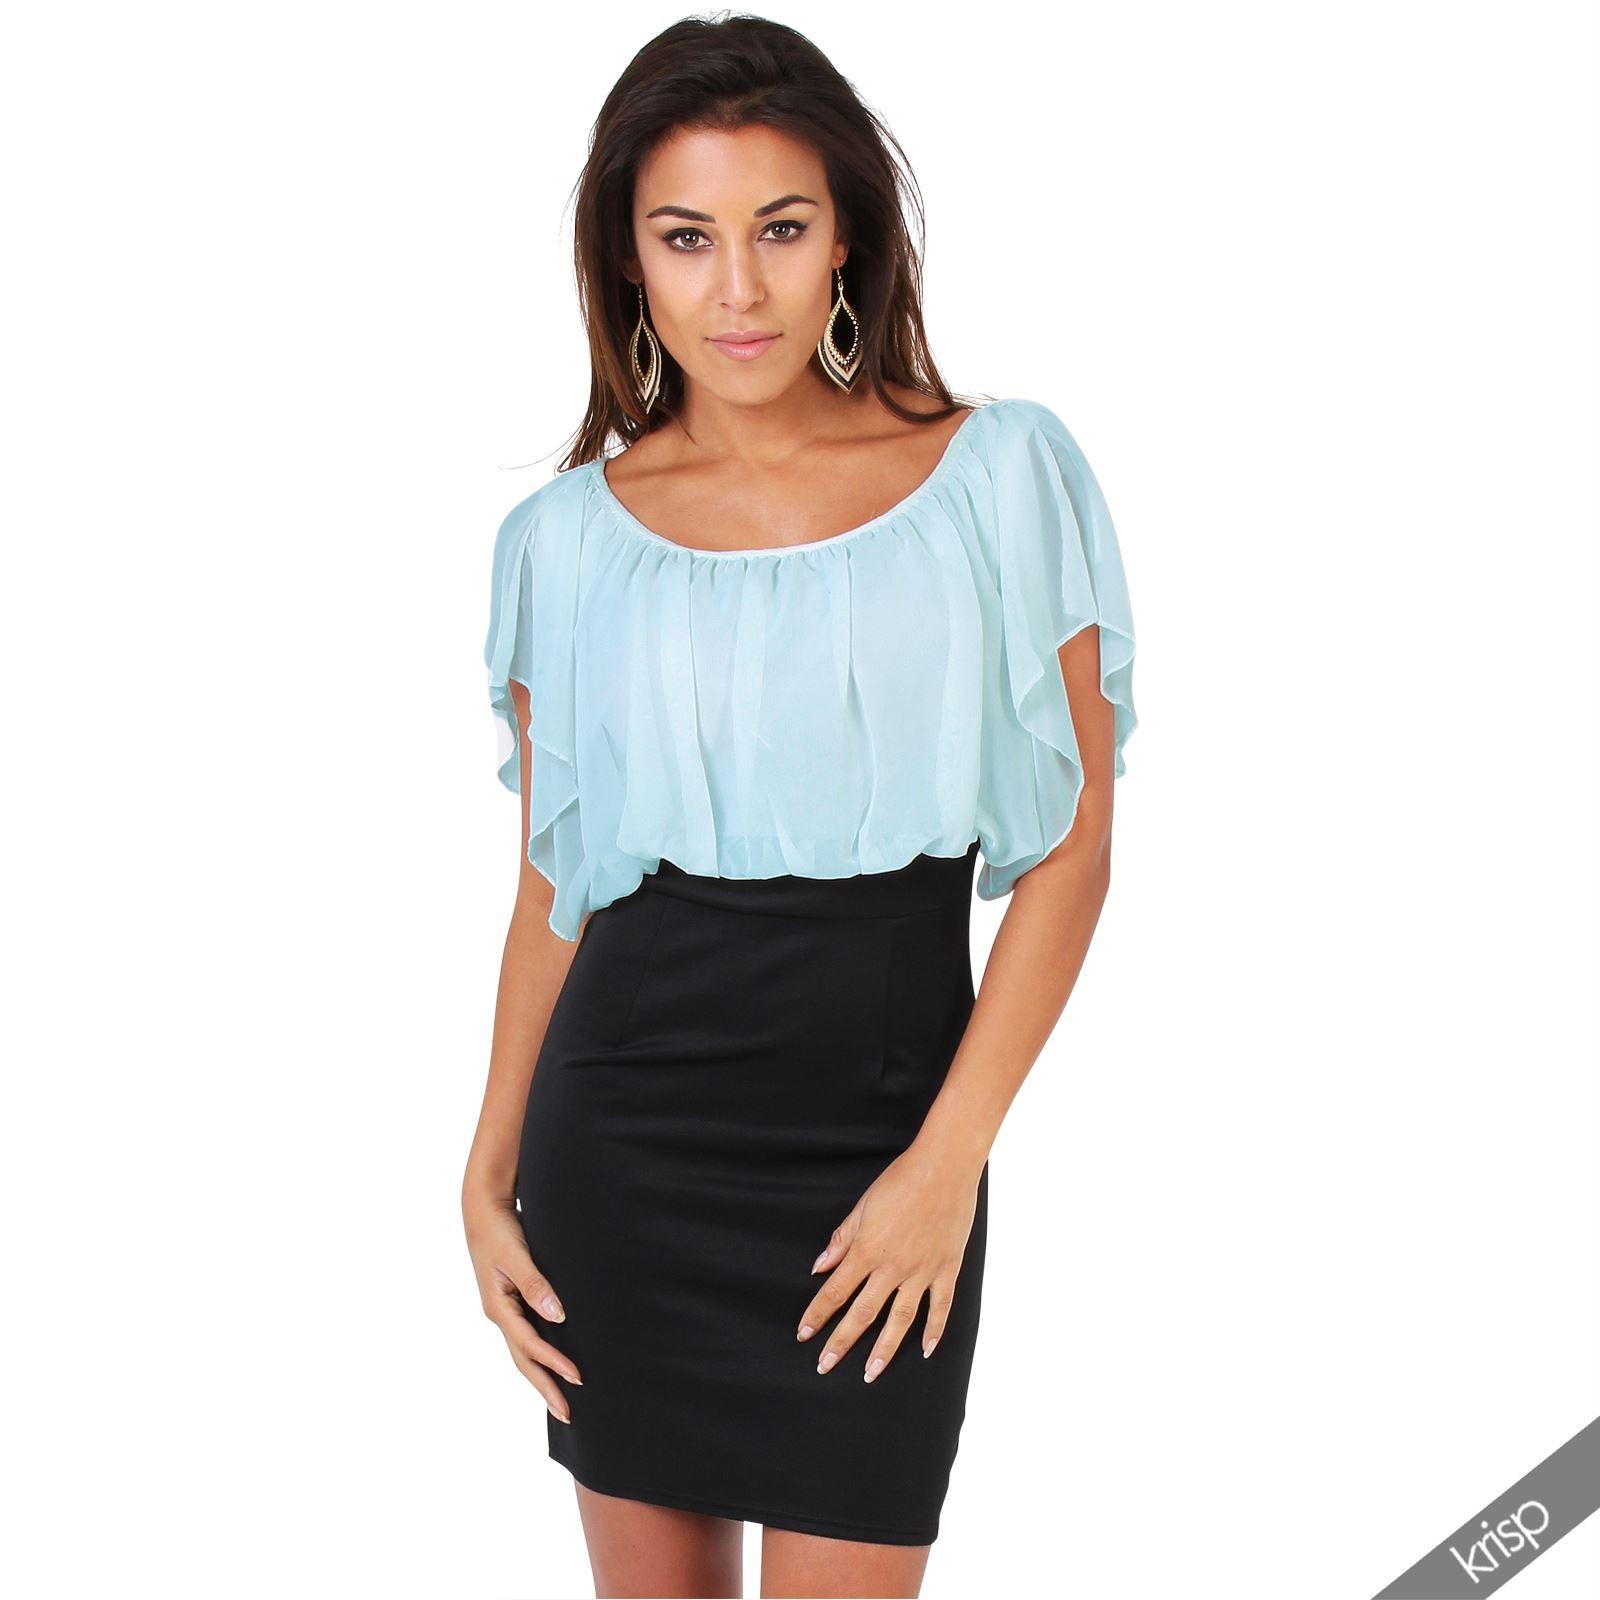 NEW Womens Elegant Bodycon Dress Business Pencil Skirt ...